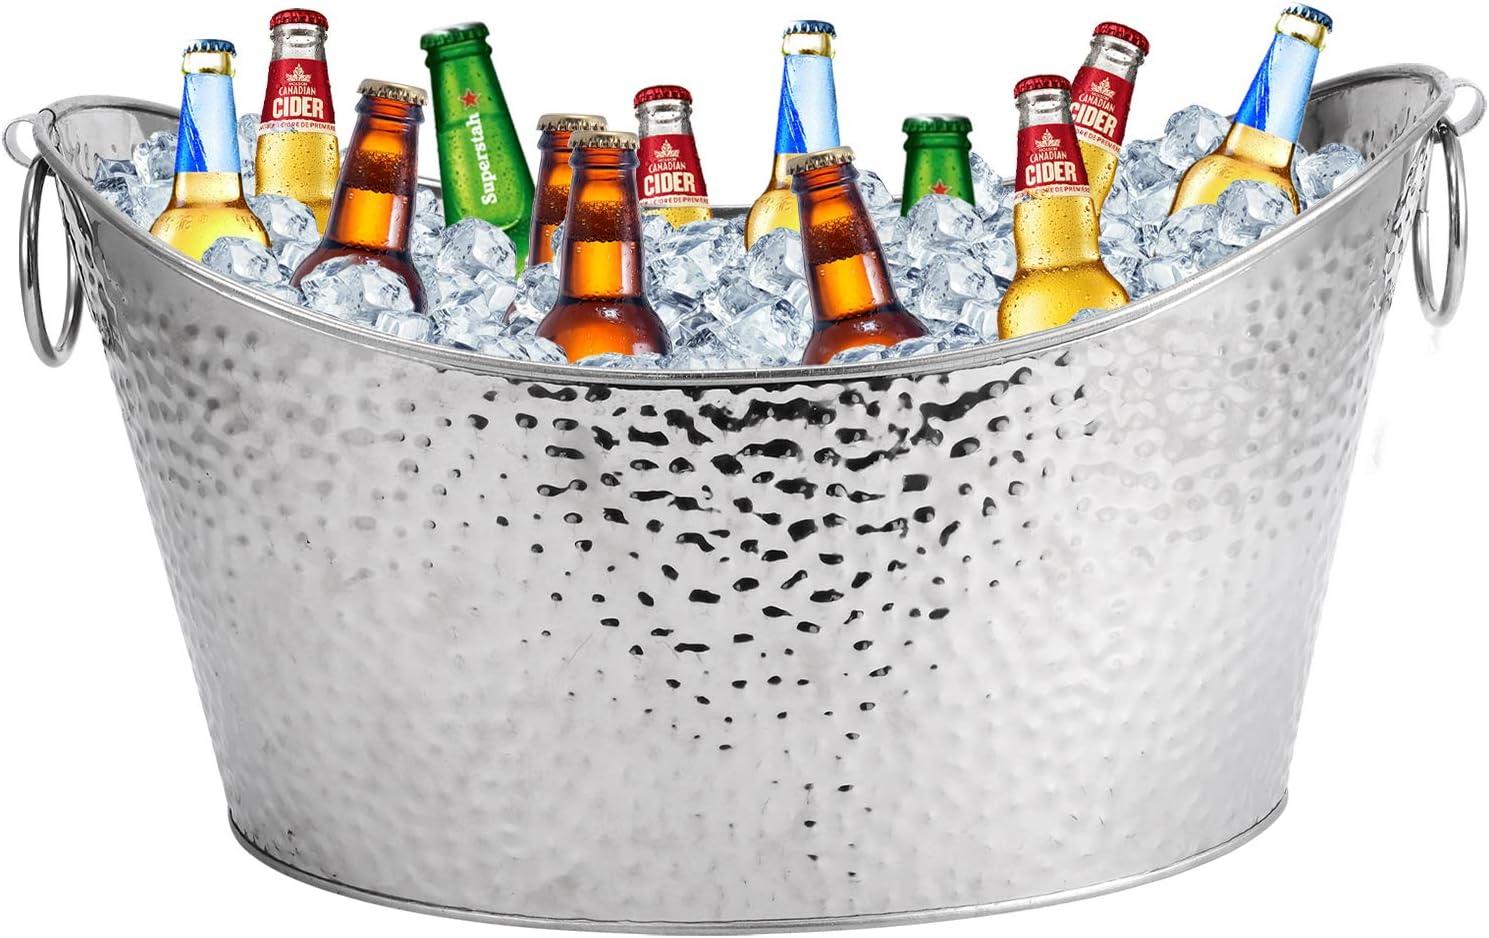 Stainless Steel Beverage Tubs Large Ice BucketDrink Buckets for Parties Weddings 12L